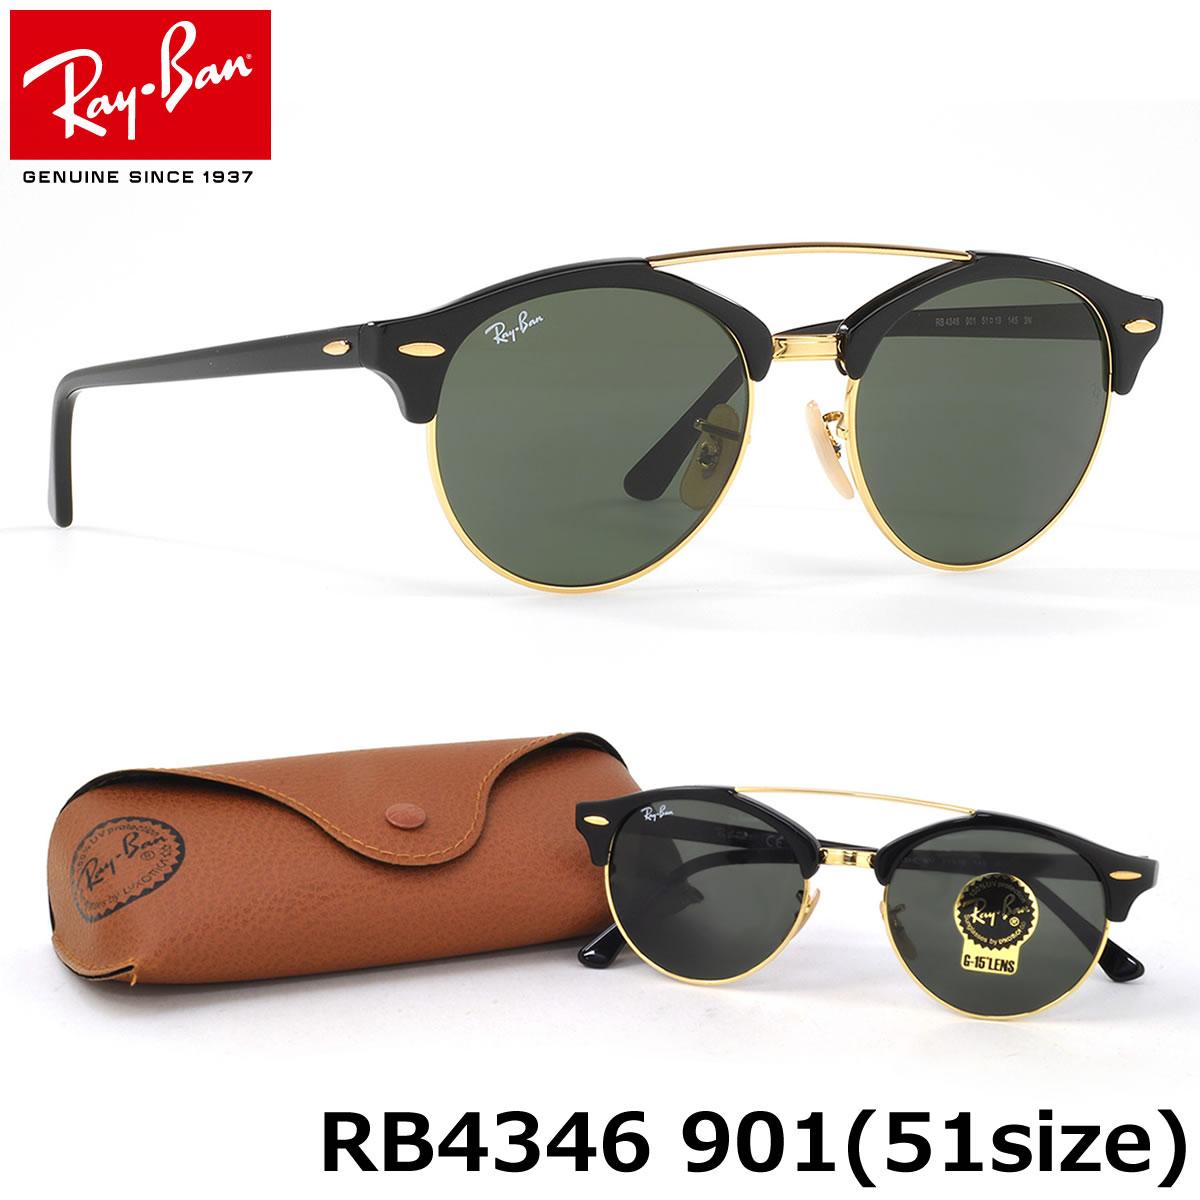 Ray Ban RB4346 901 CLUBROUND Double bridge